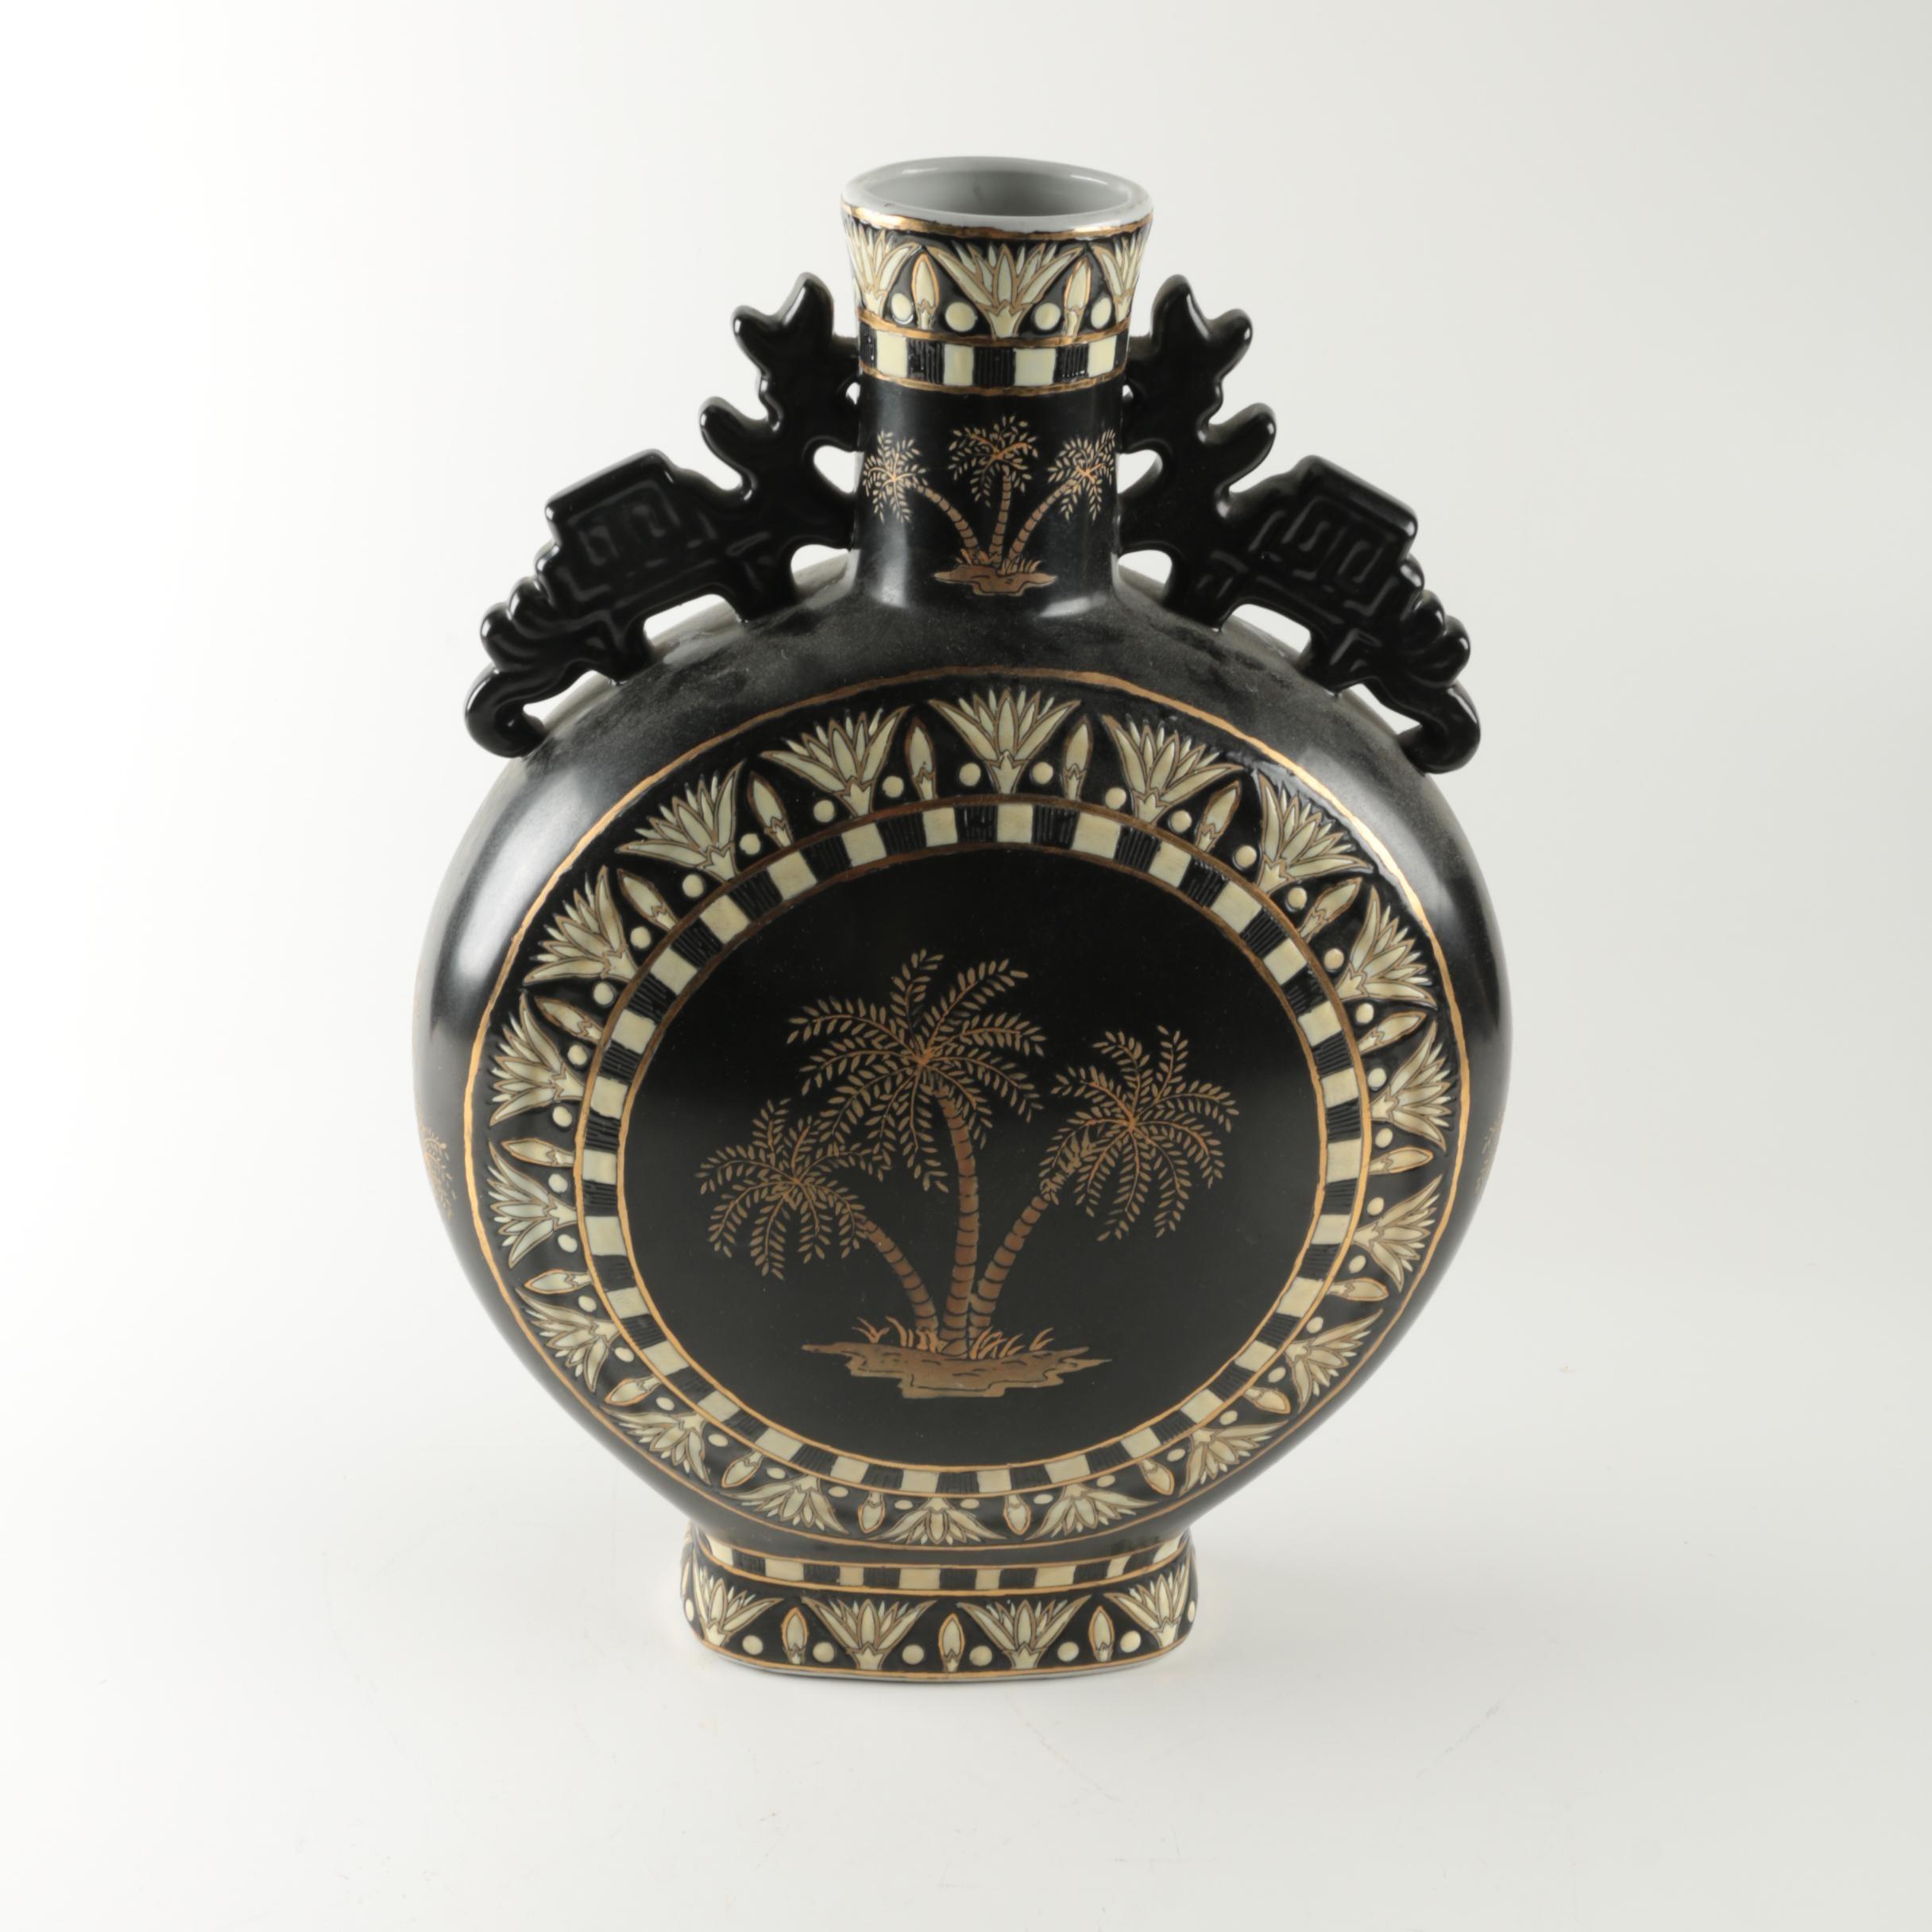 Chinese Porcelain Moon Flask Vase with Enameled Palm Tree Motif